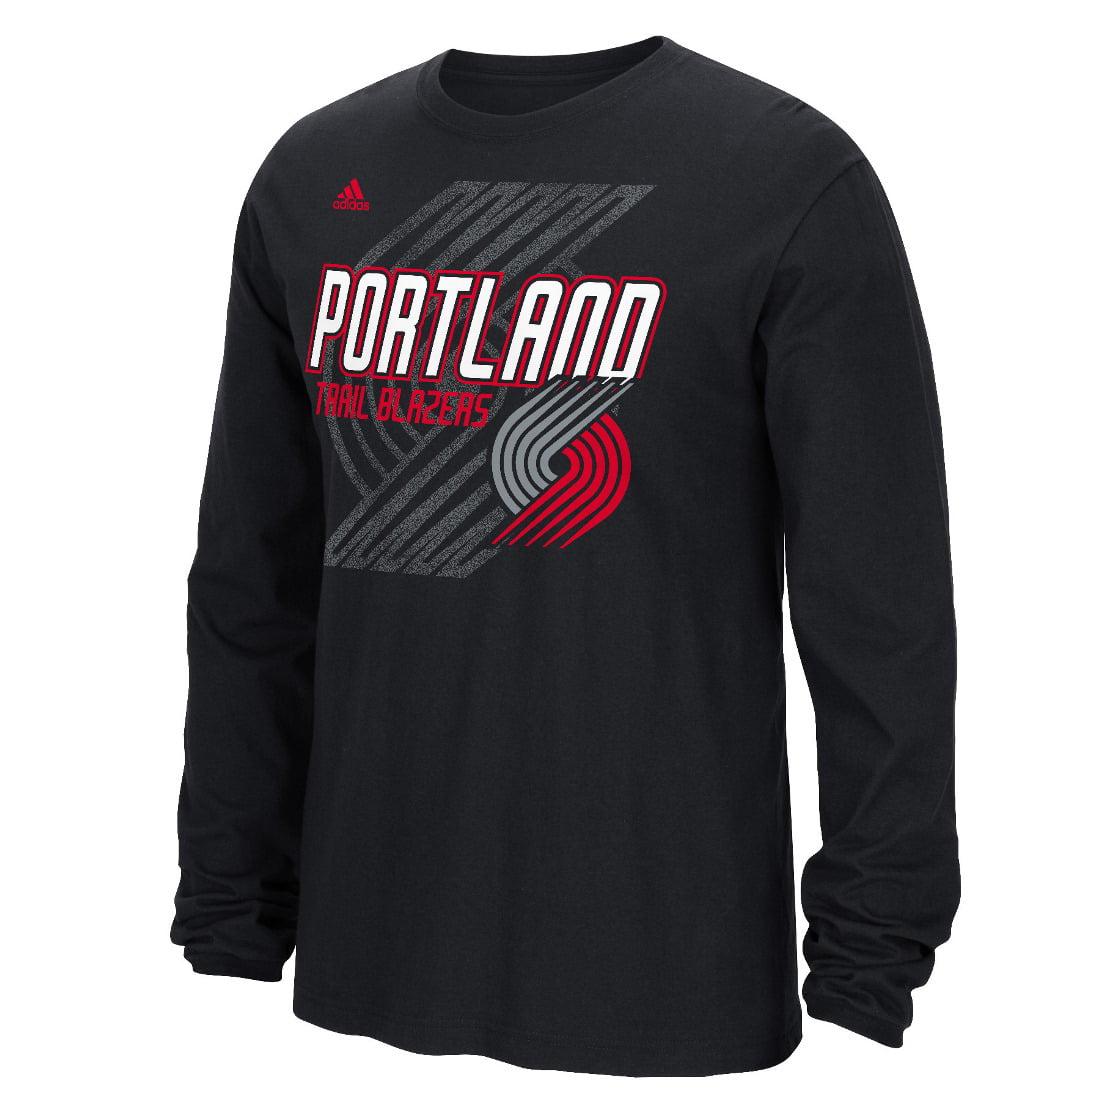 Portland Trail Blazers Adidas NBA Distressed Back Logo Men's Long Sleeve T-Shirt by Adidas